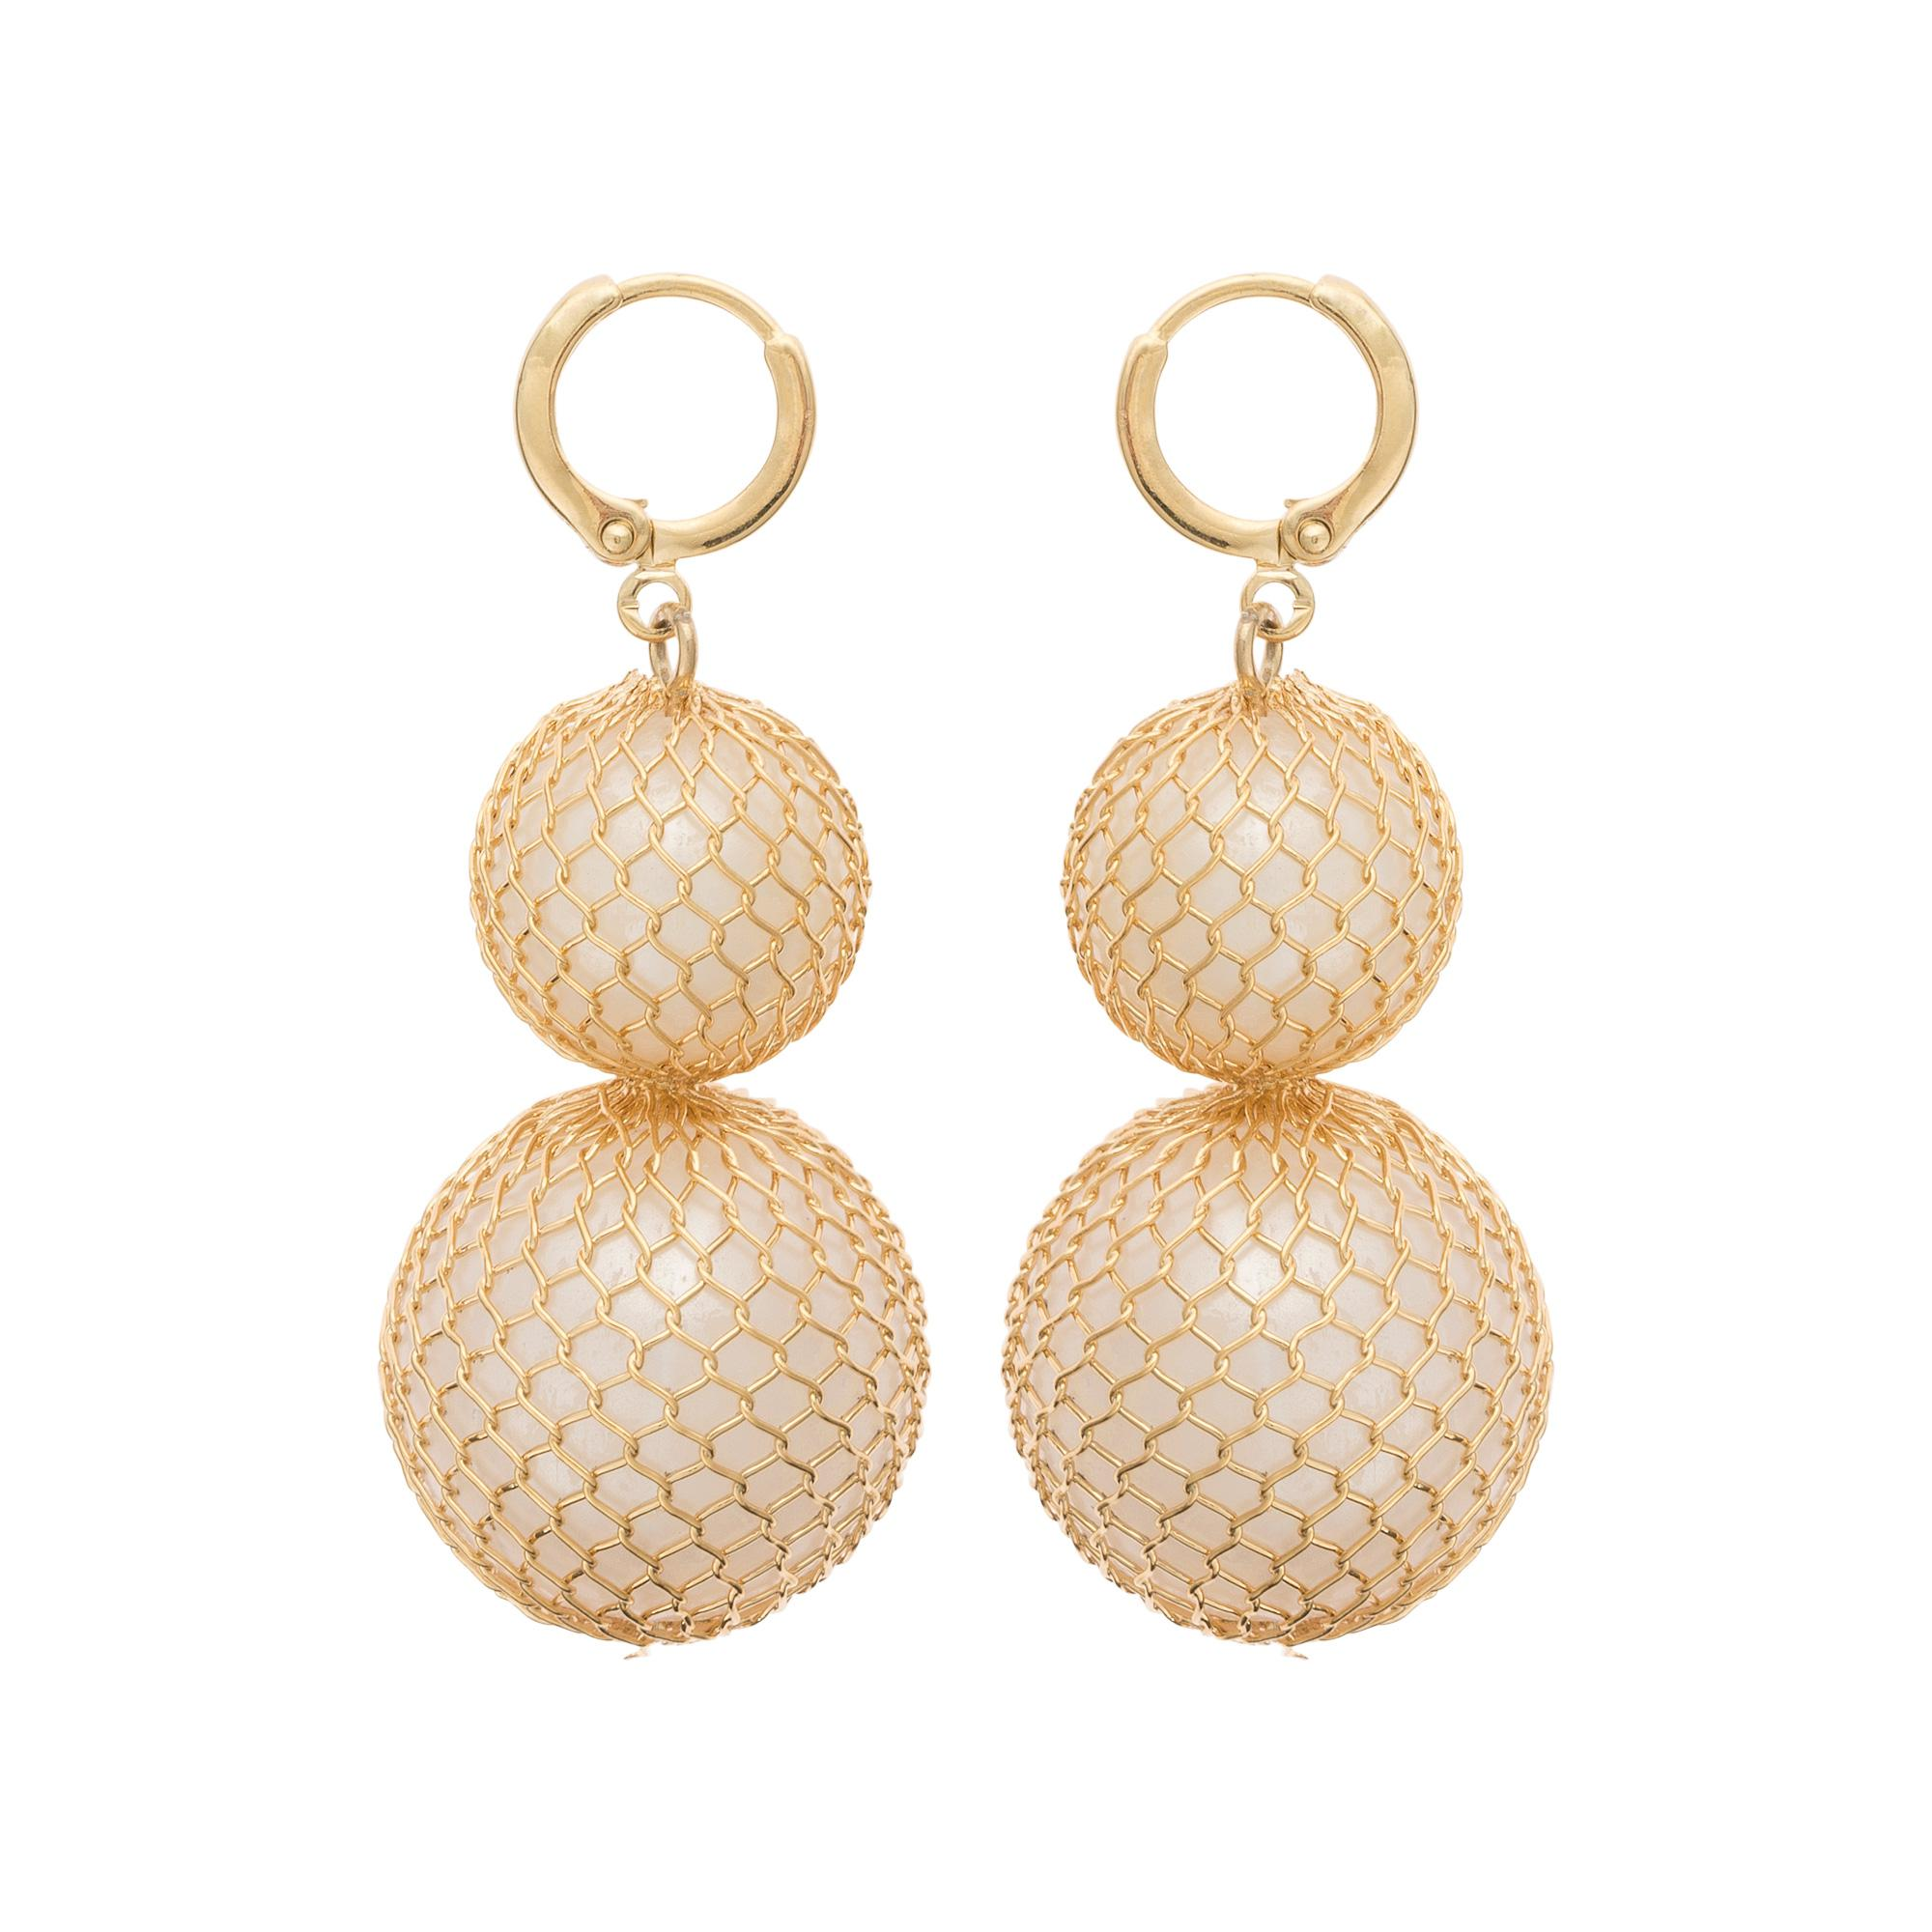 Lyst - Oliver Bonas Cleodora Mesh Wrapped Bead Earrings in Metallic